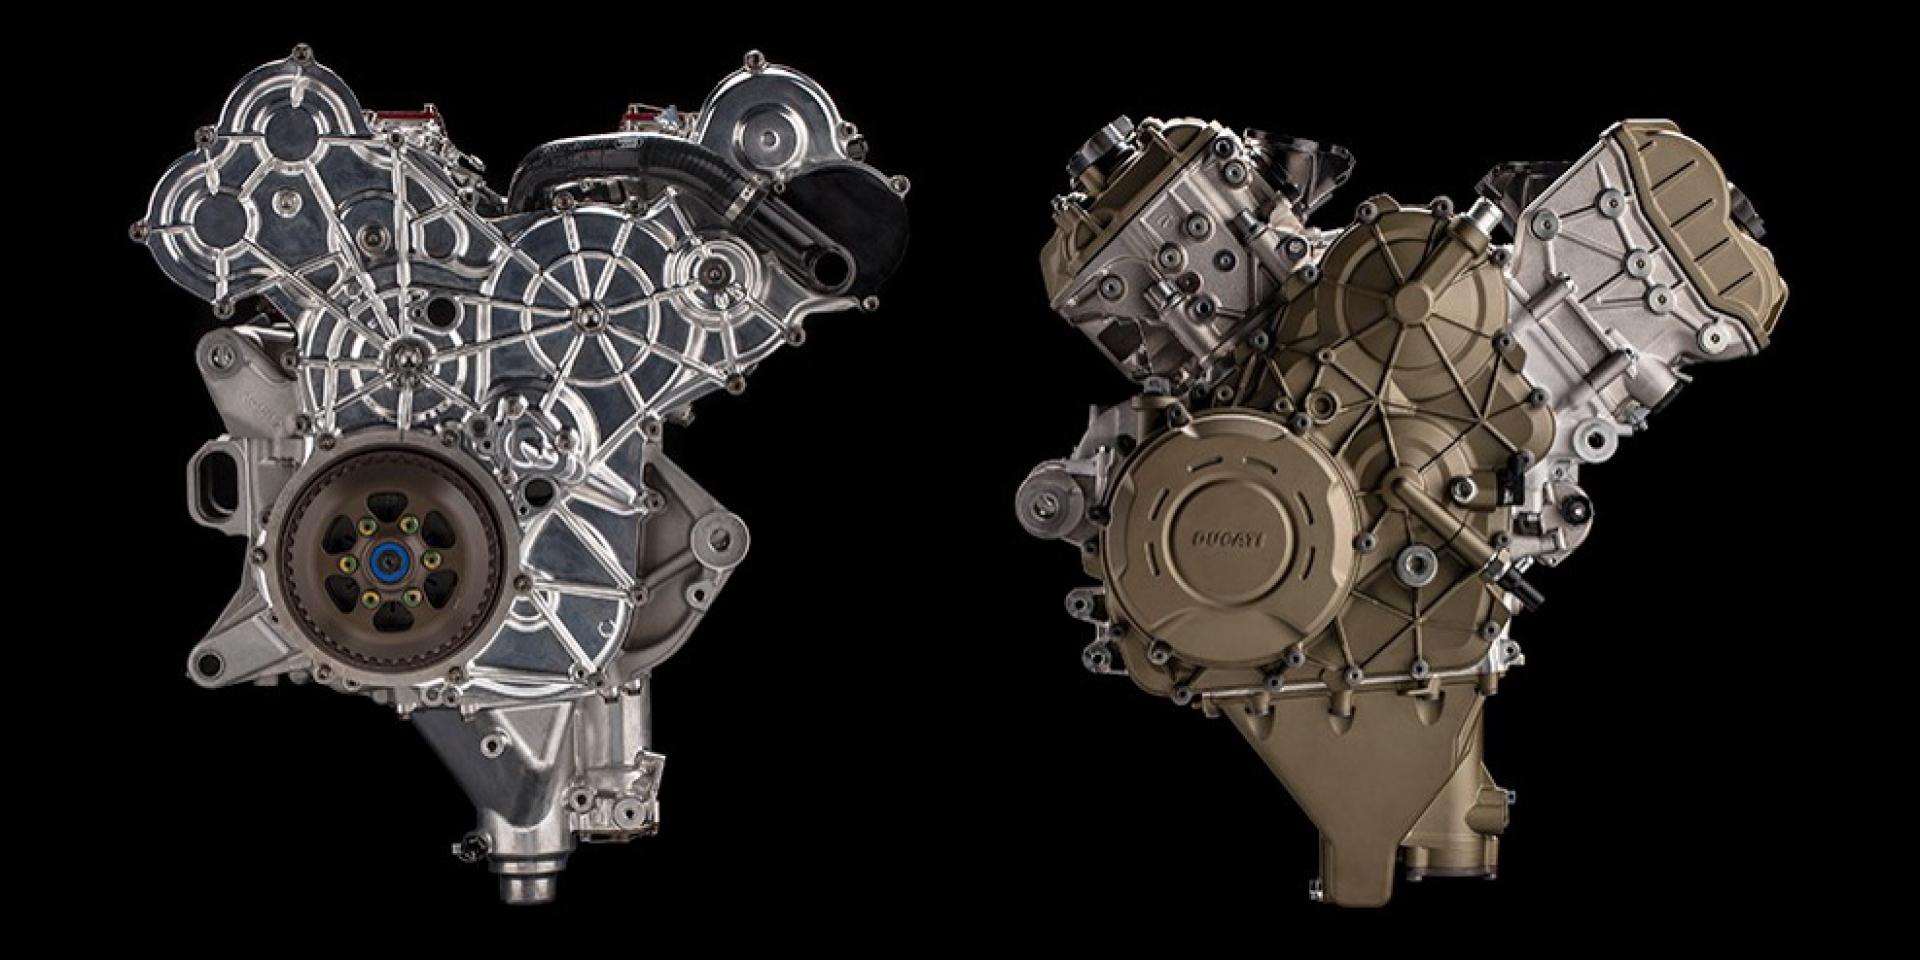 源自MotoGP的競賽工藝,DUCATI Desmosedici Stradale V4深度解析